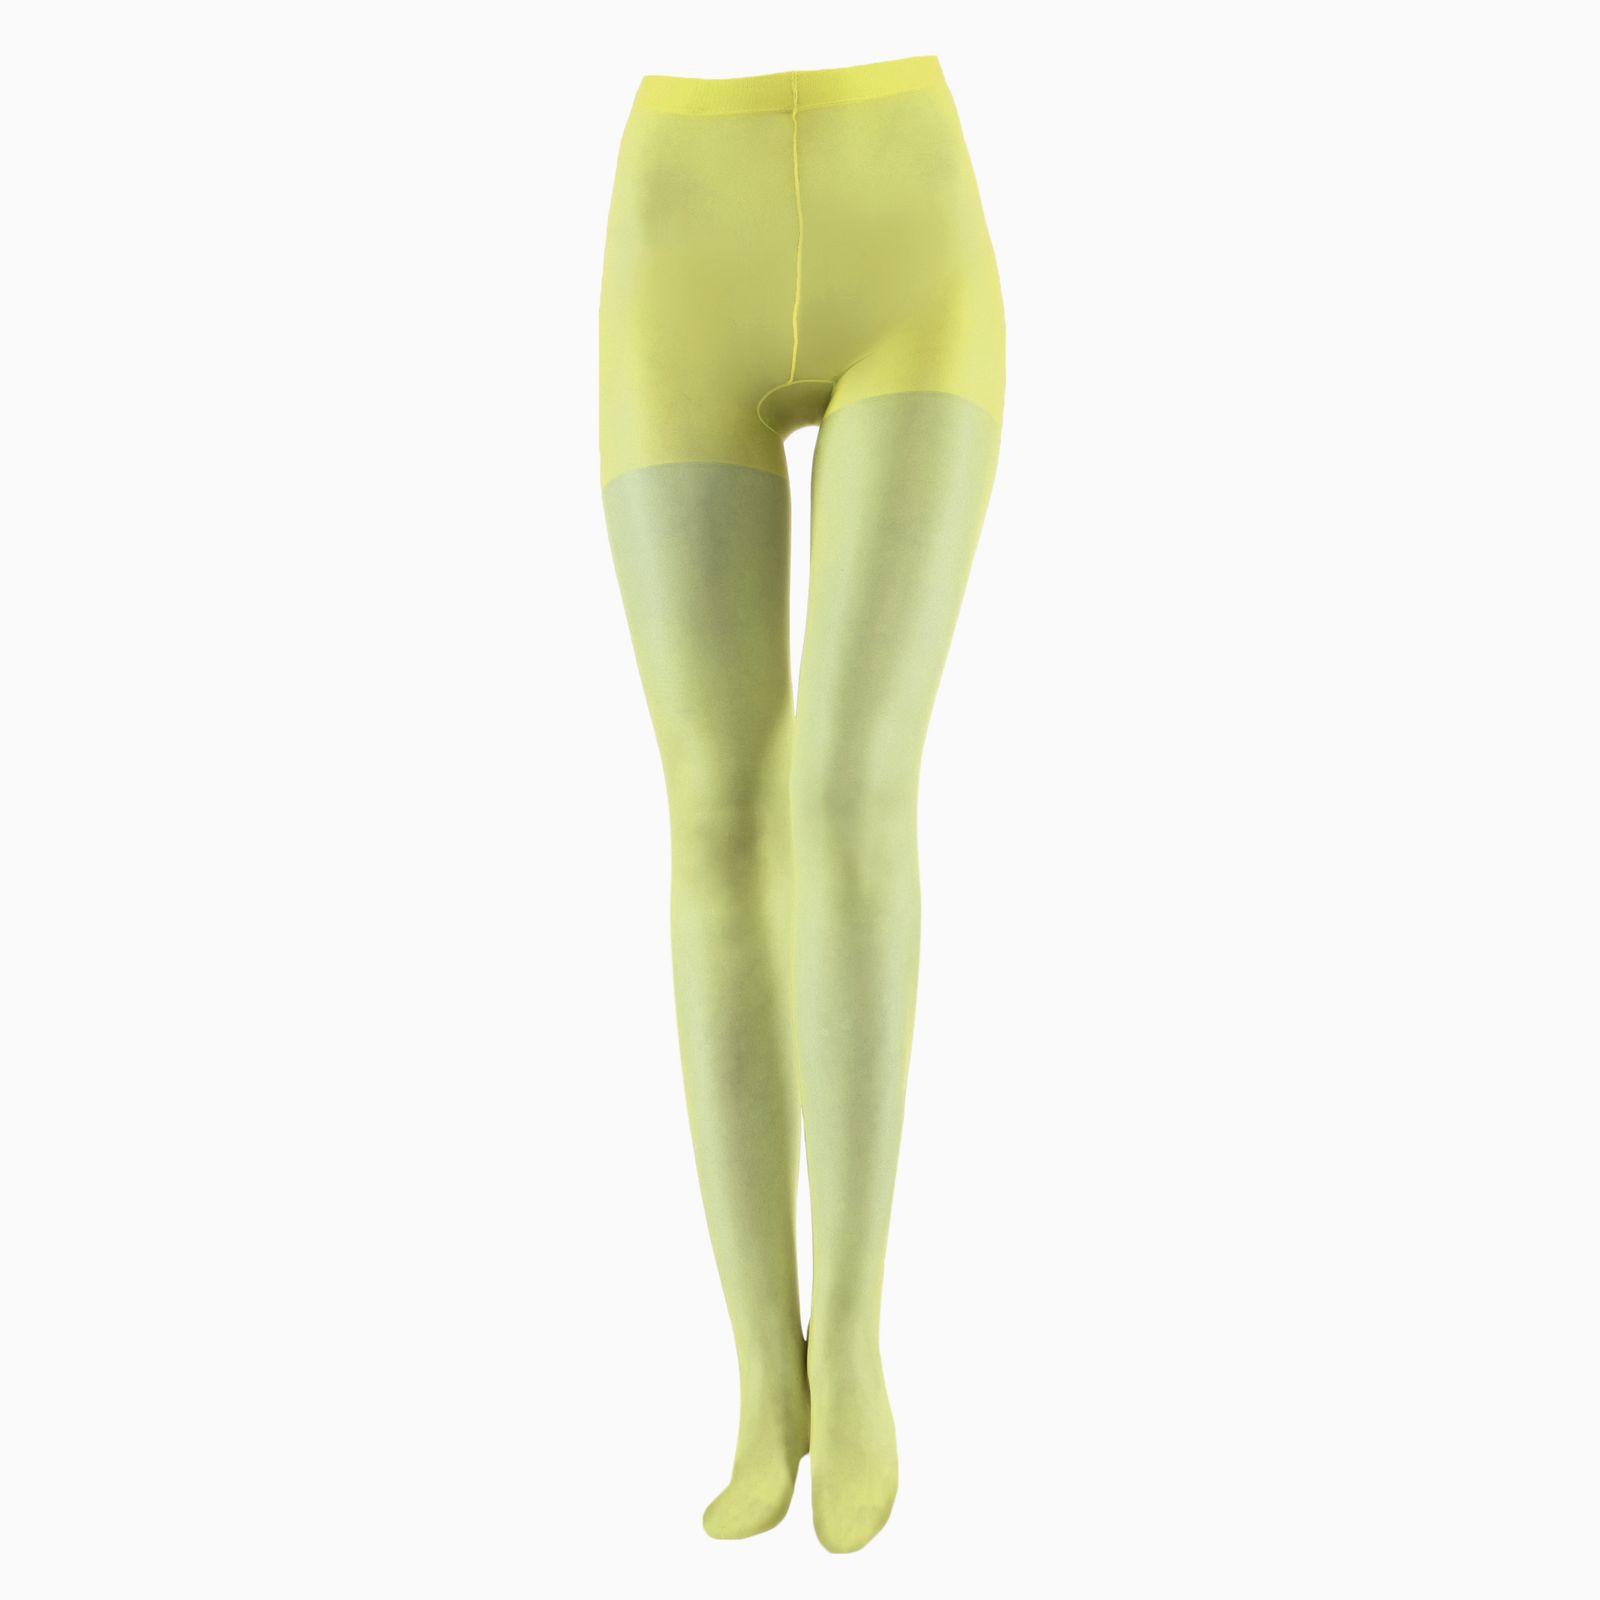 جوراب شلواری زنانه مدل Z106 -  - 4